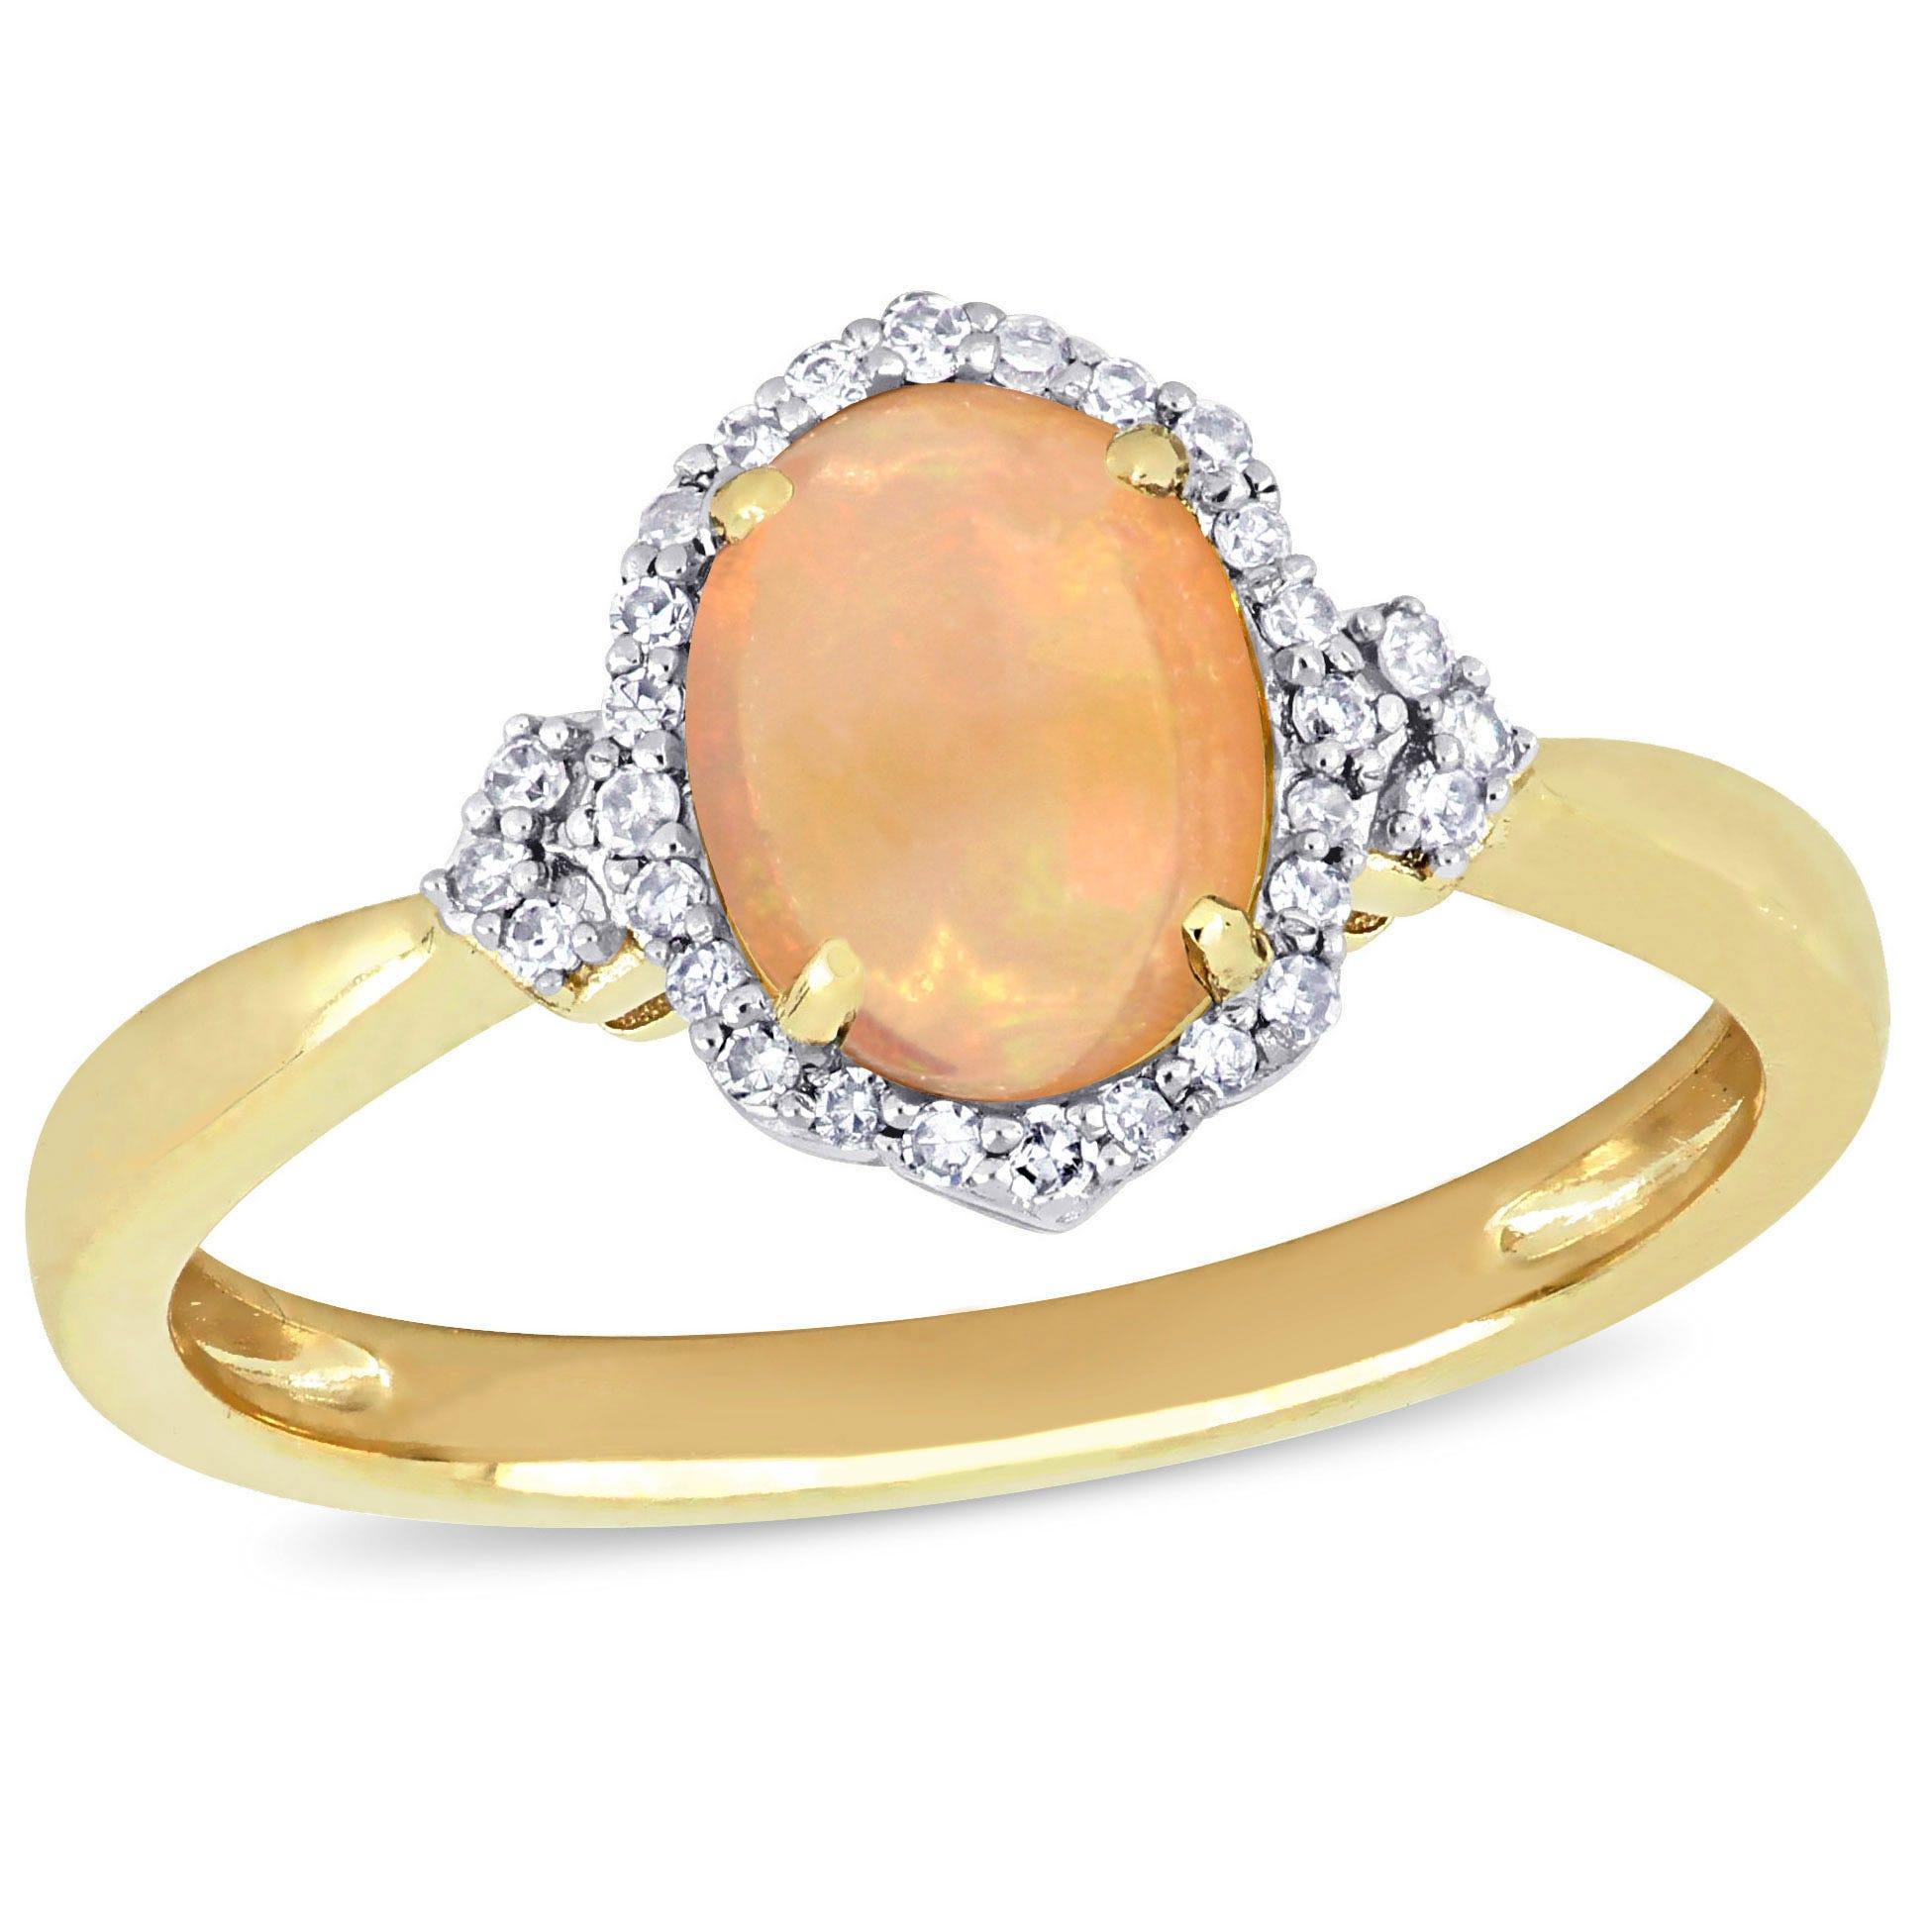 Ethiopian Oval Opal & Diamond Halo Ring in 10k Yellow Gold